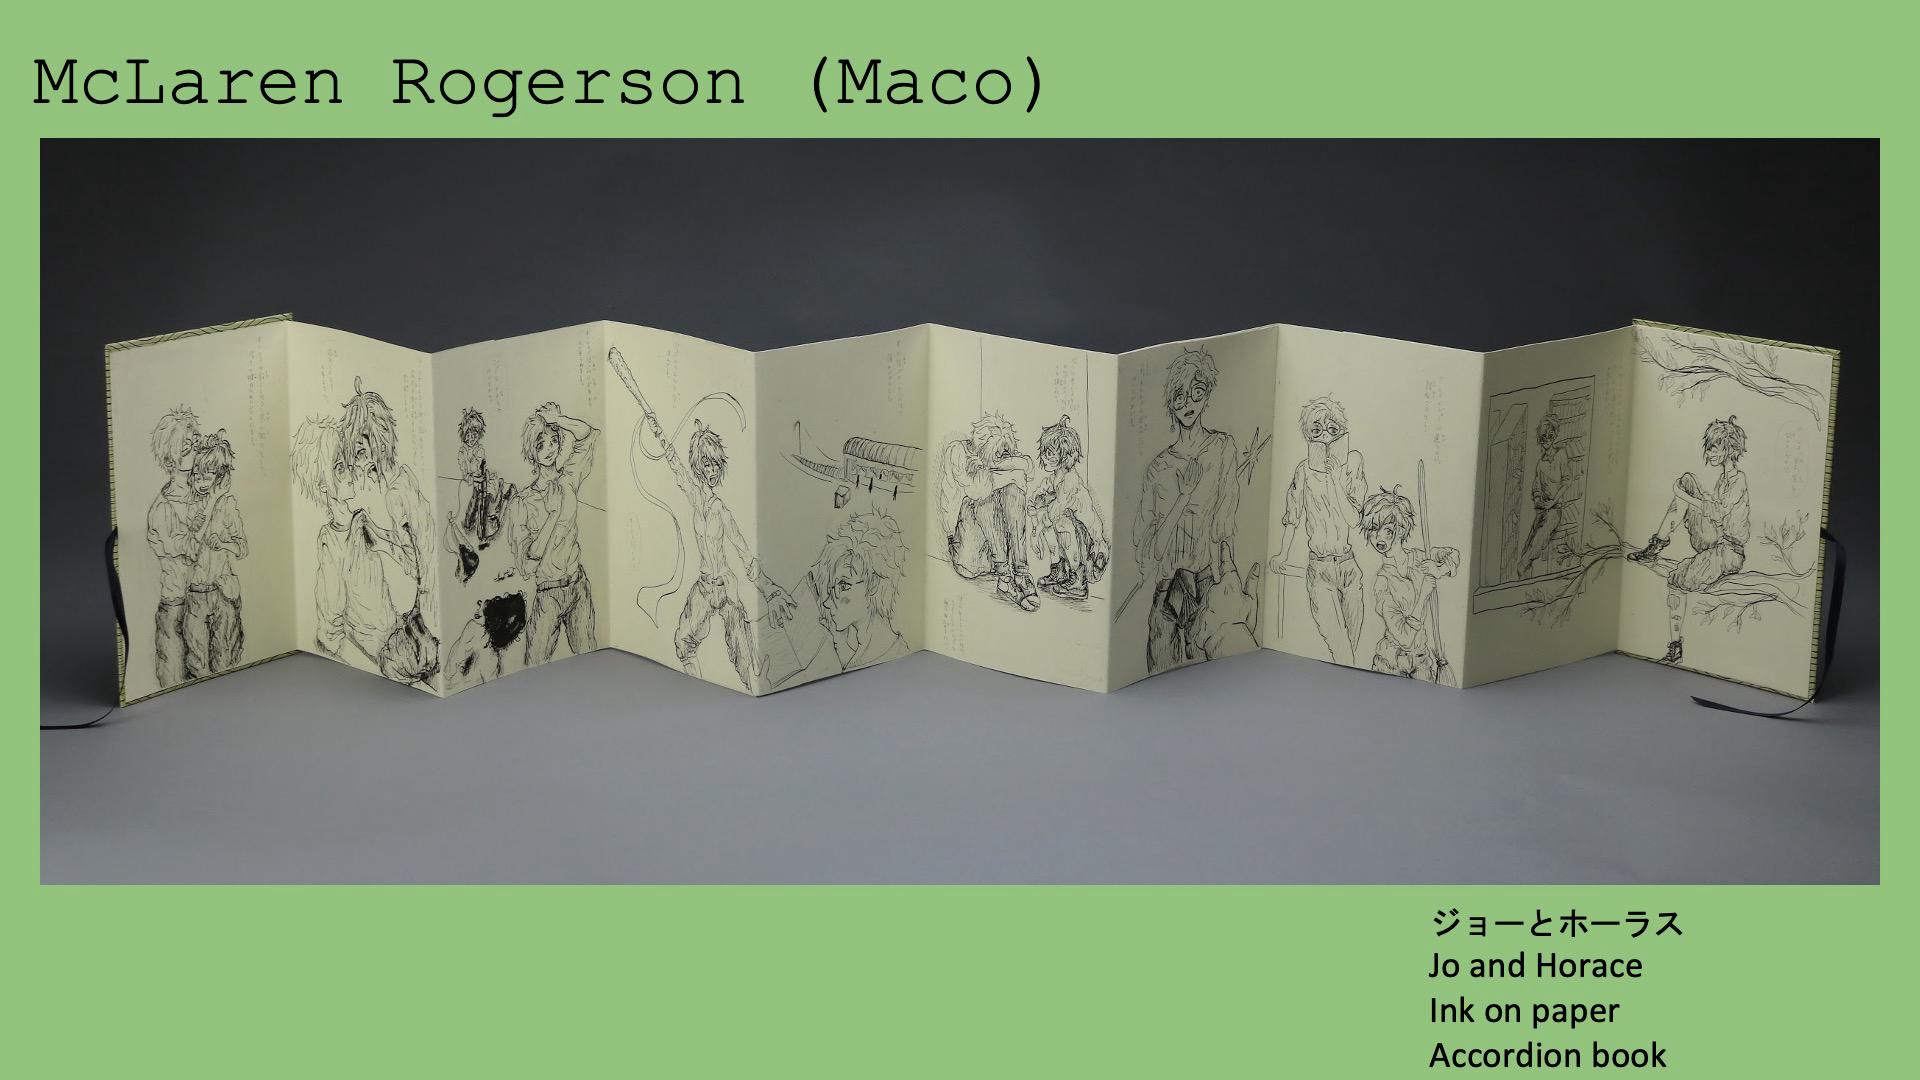 McLaren Rogerson (Maco), ジョーとホーラス - Jo and Horace